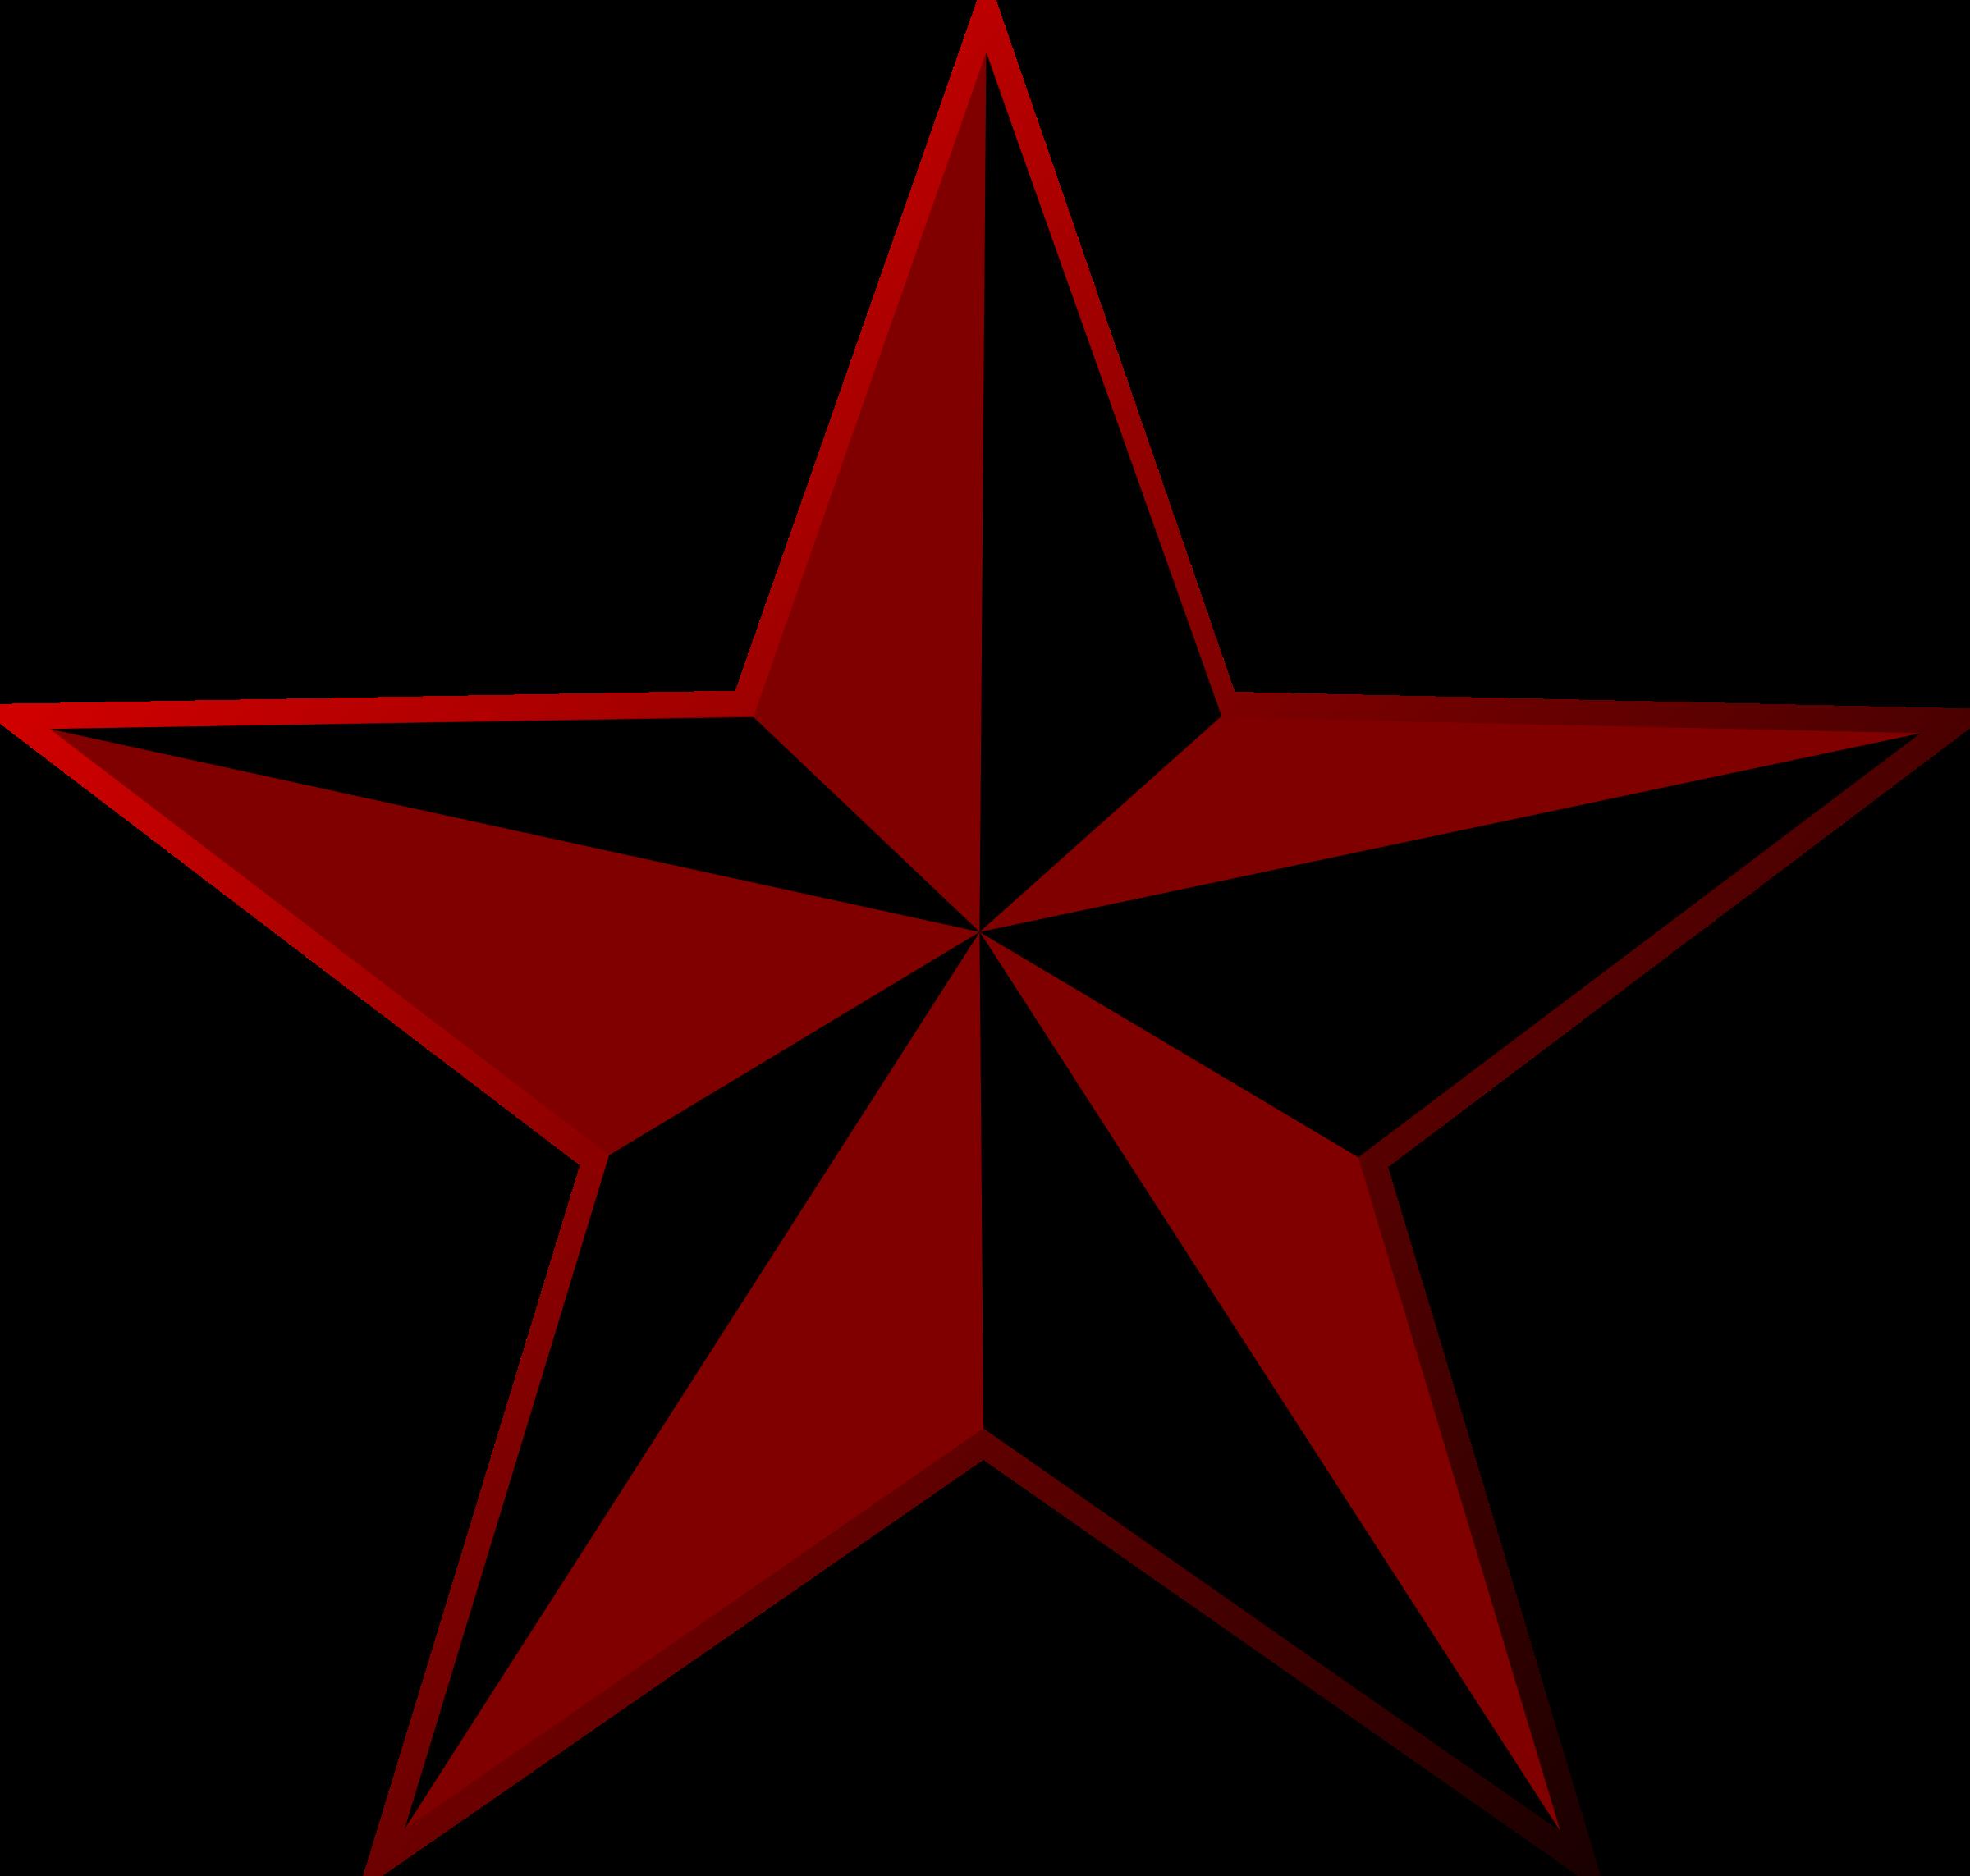 Star black clipart jpg freeuse Clipart - Punk Star jpg freeuse